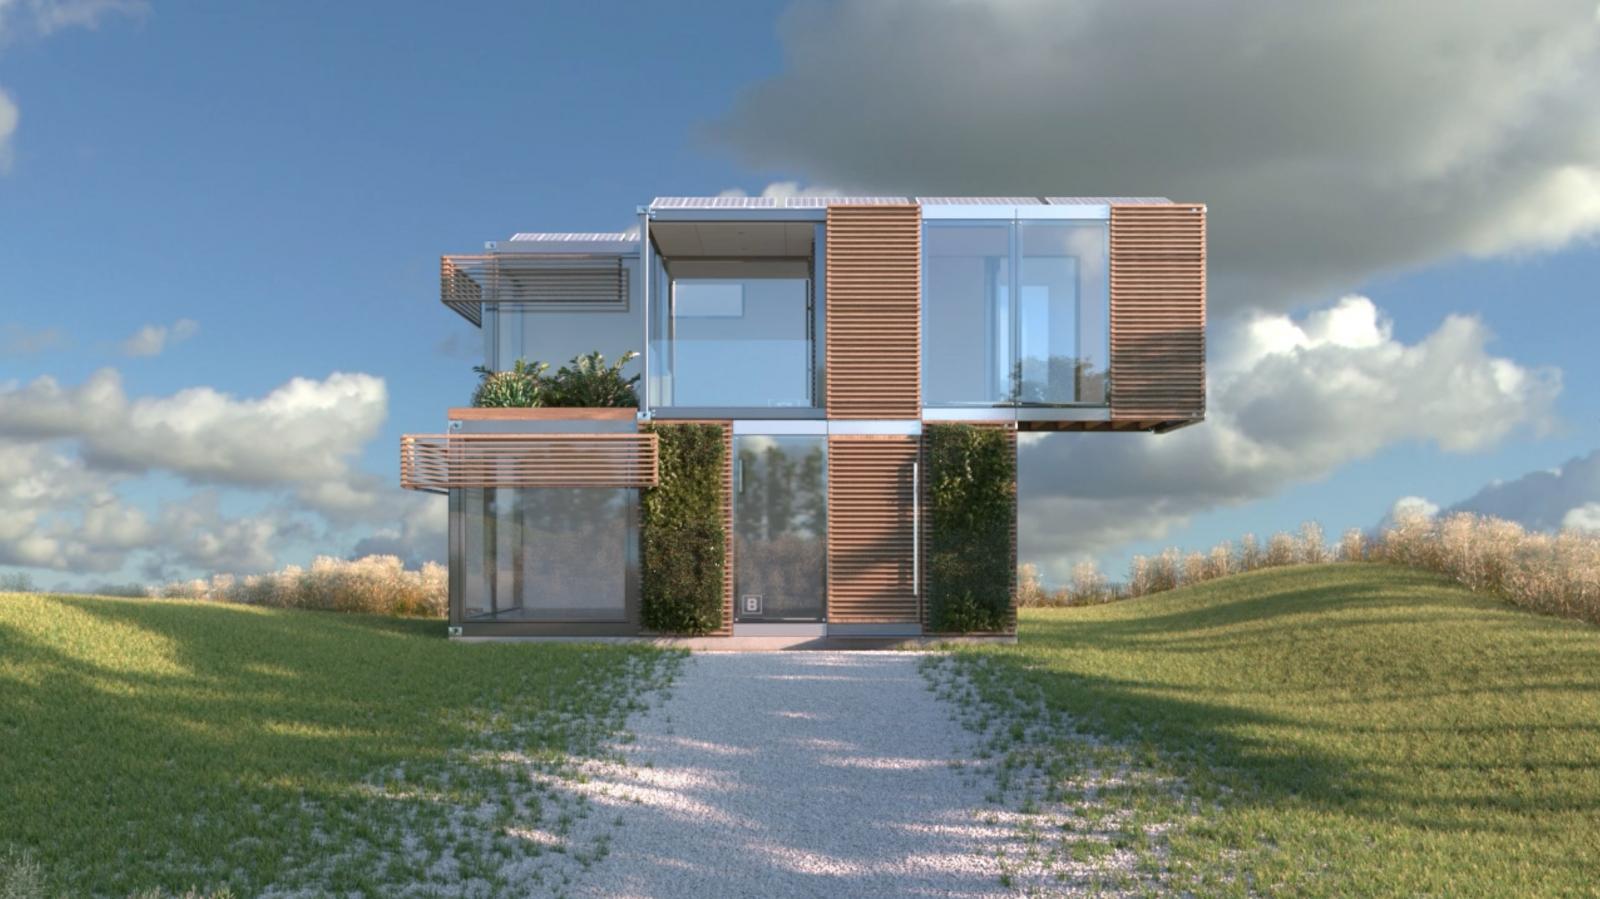 Blokable modular family home